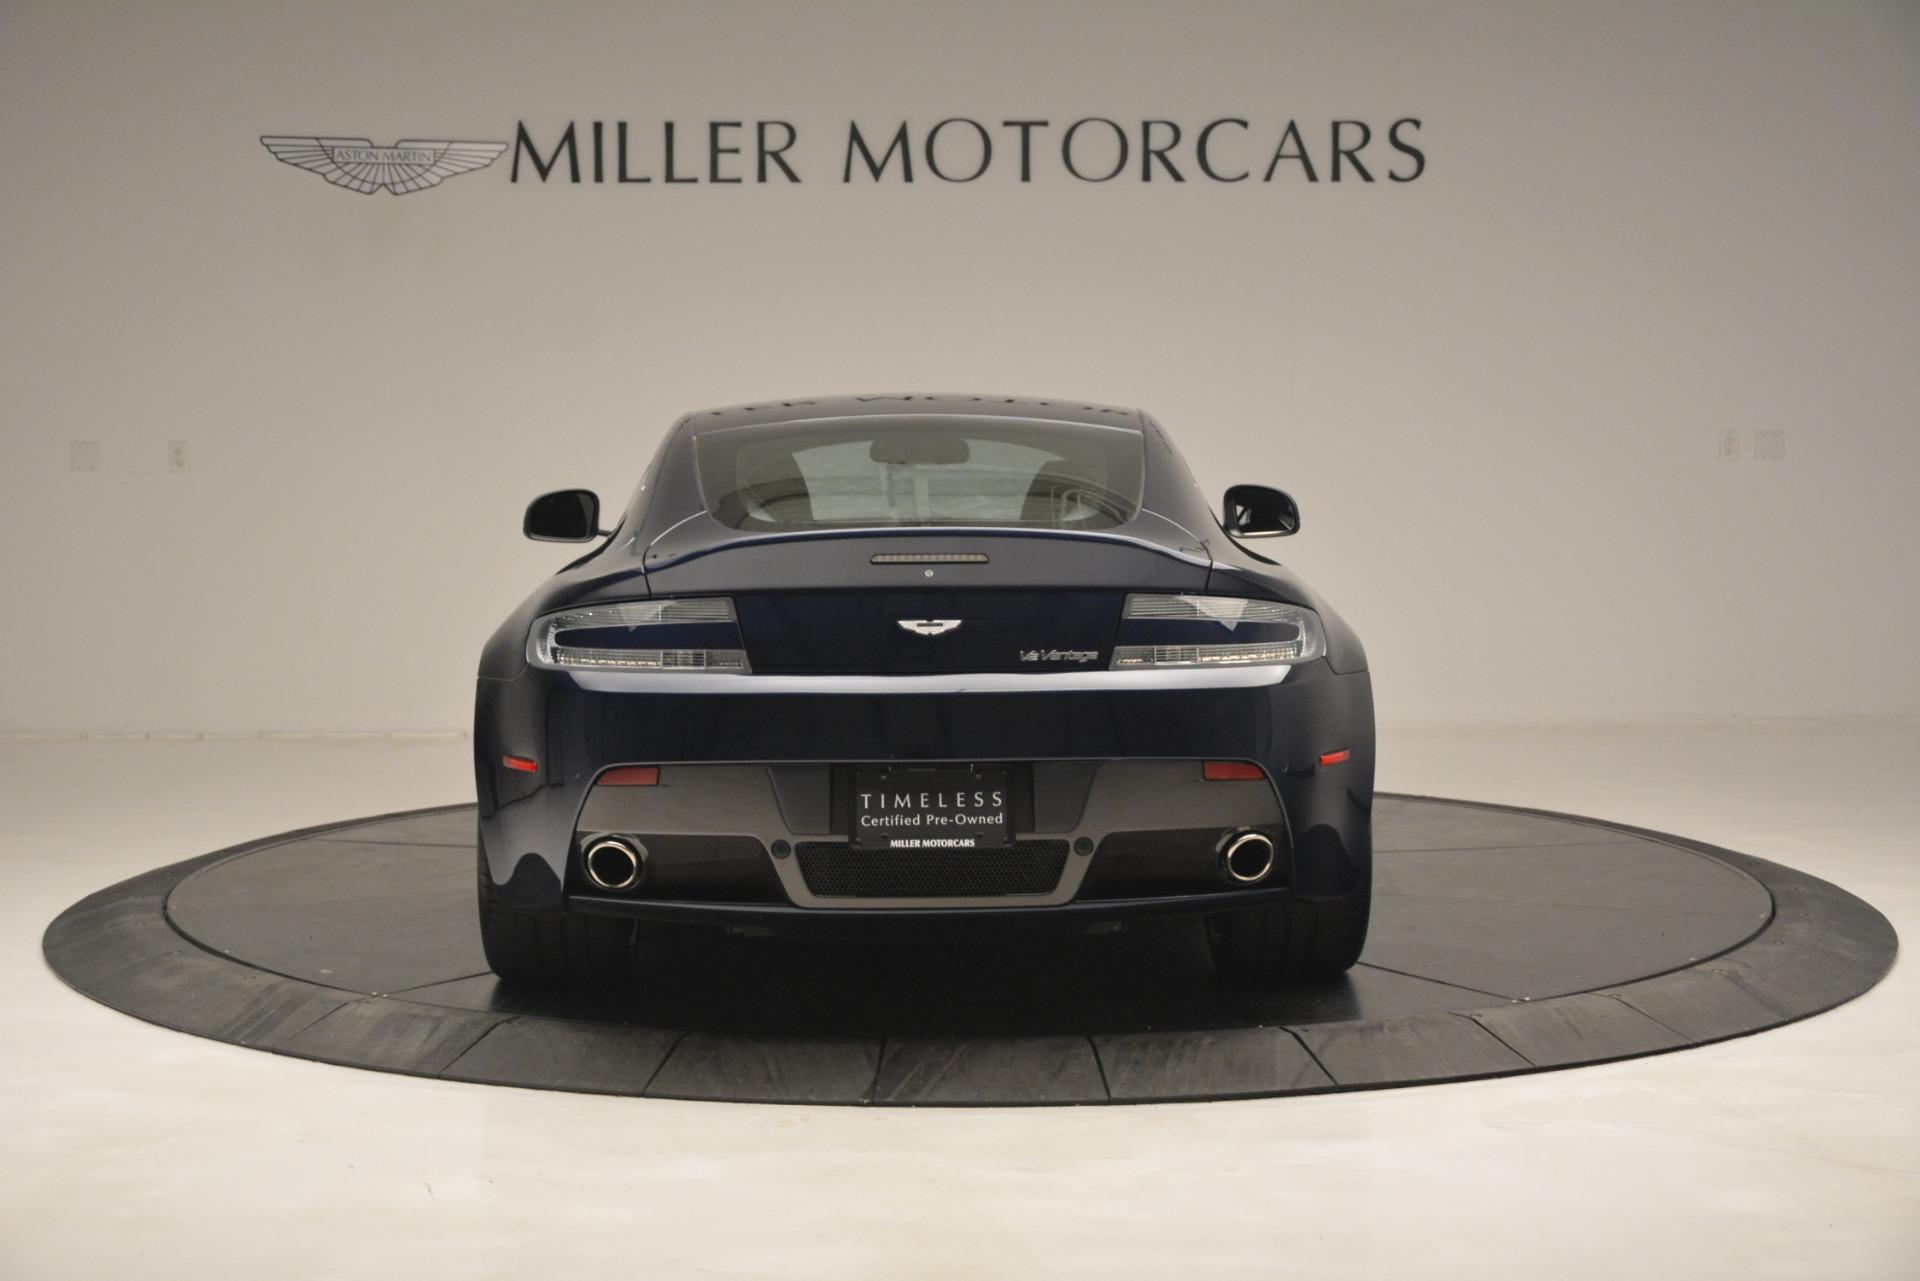 Used 2012 Aston Martin V12 Vantage  For Sale In Greenwich, CT 3046_p6